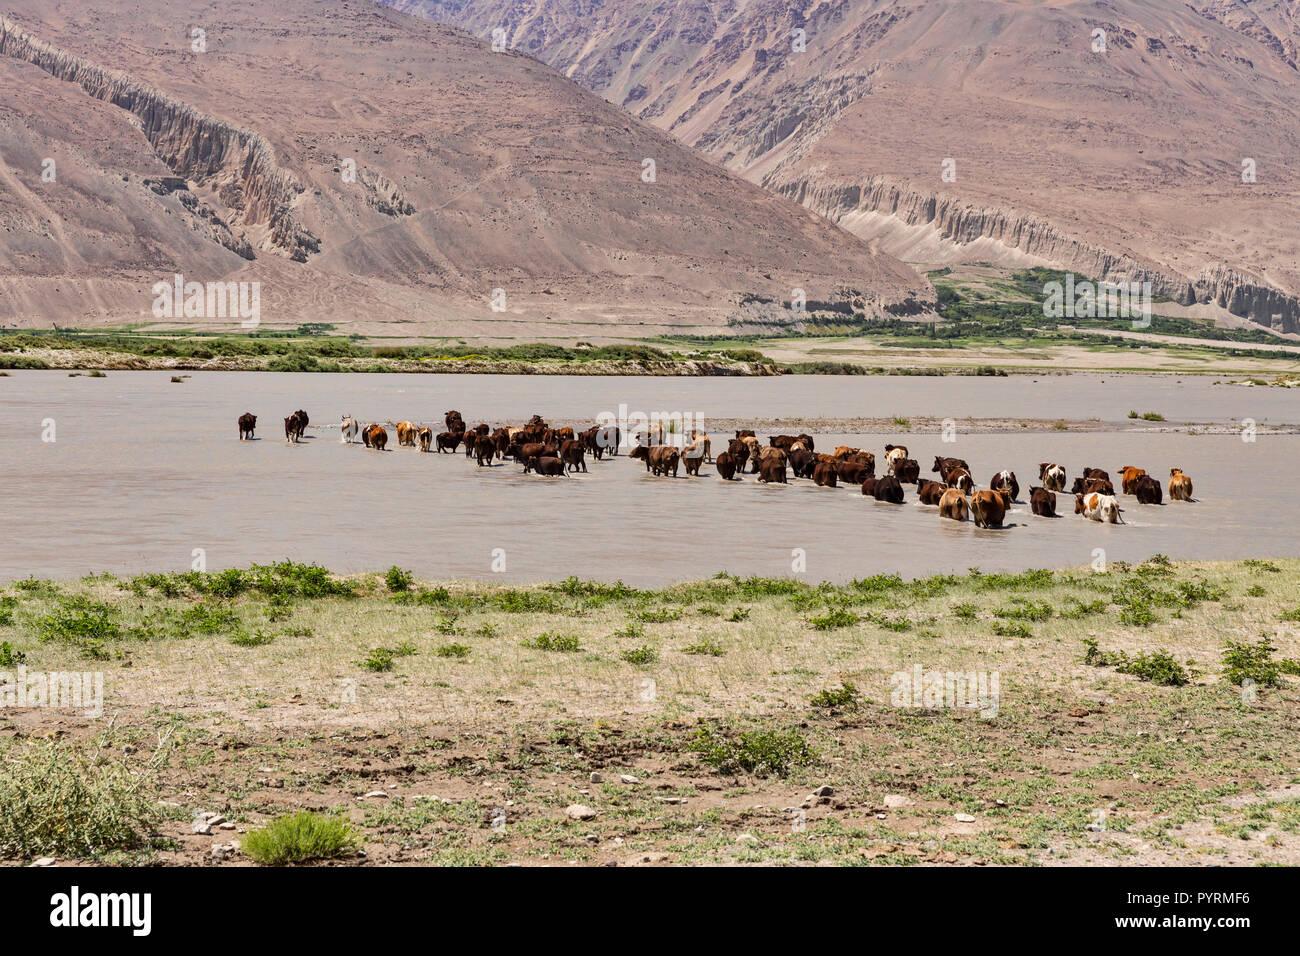 Cows cross Panj River from Tajikistan to Afghanistan, Wakhan Valley, Tajikistan - Stock Image